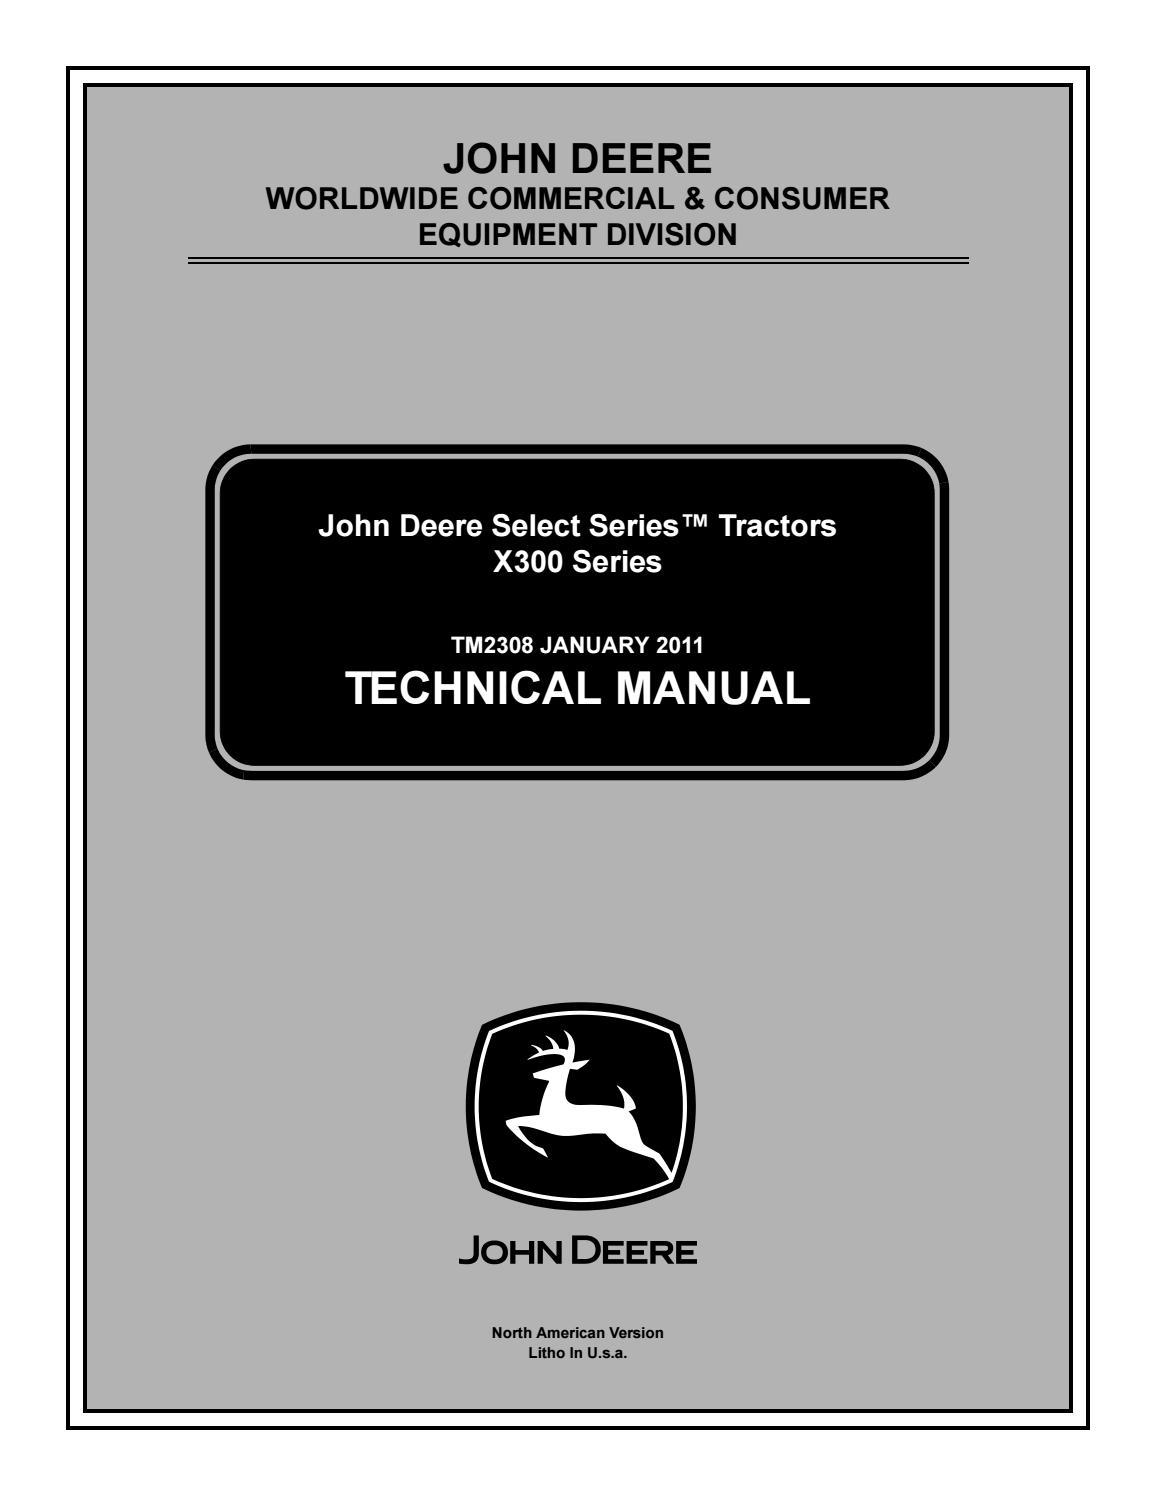 John deere x324 lawn tractor service repair manual by